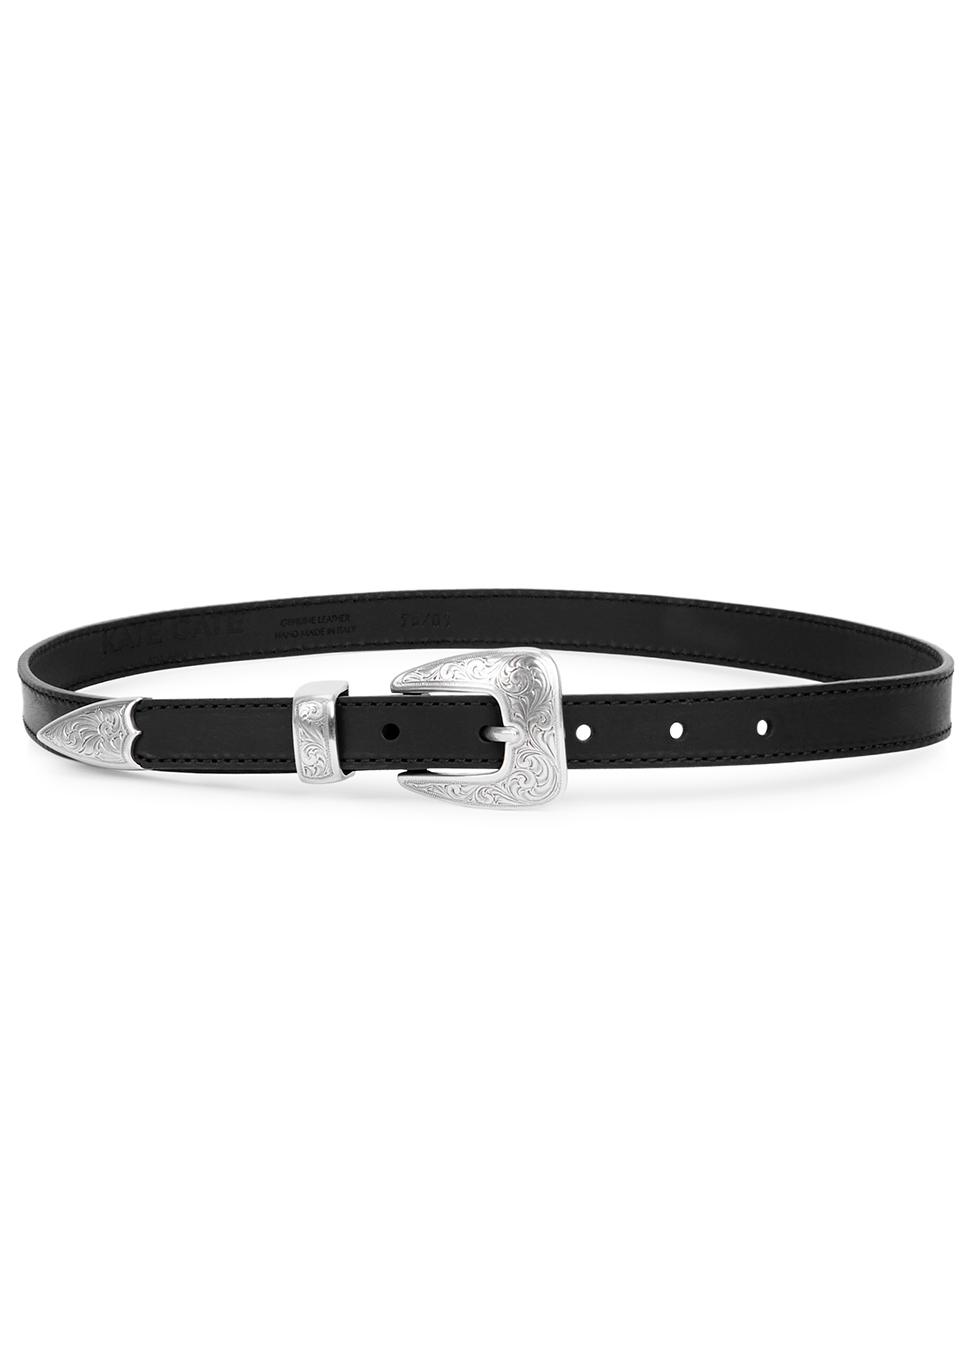 Kim black leather belt